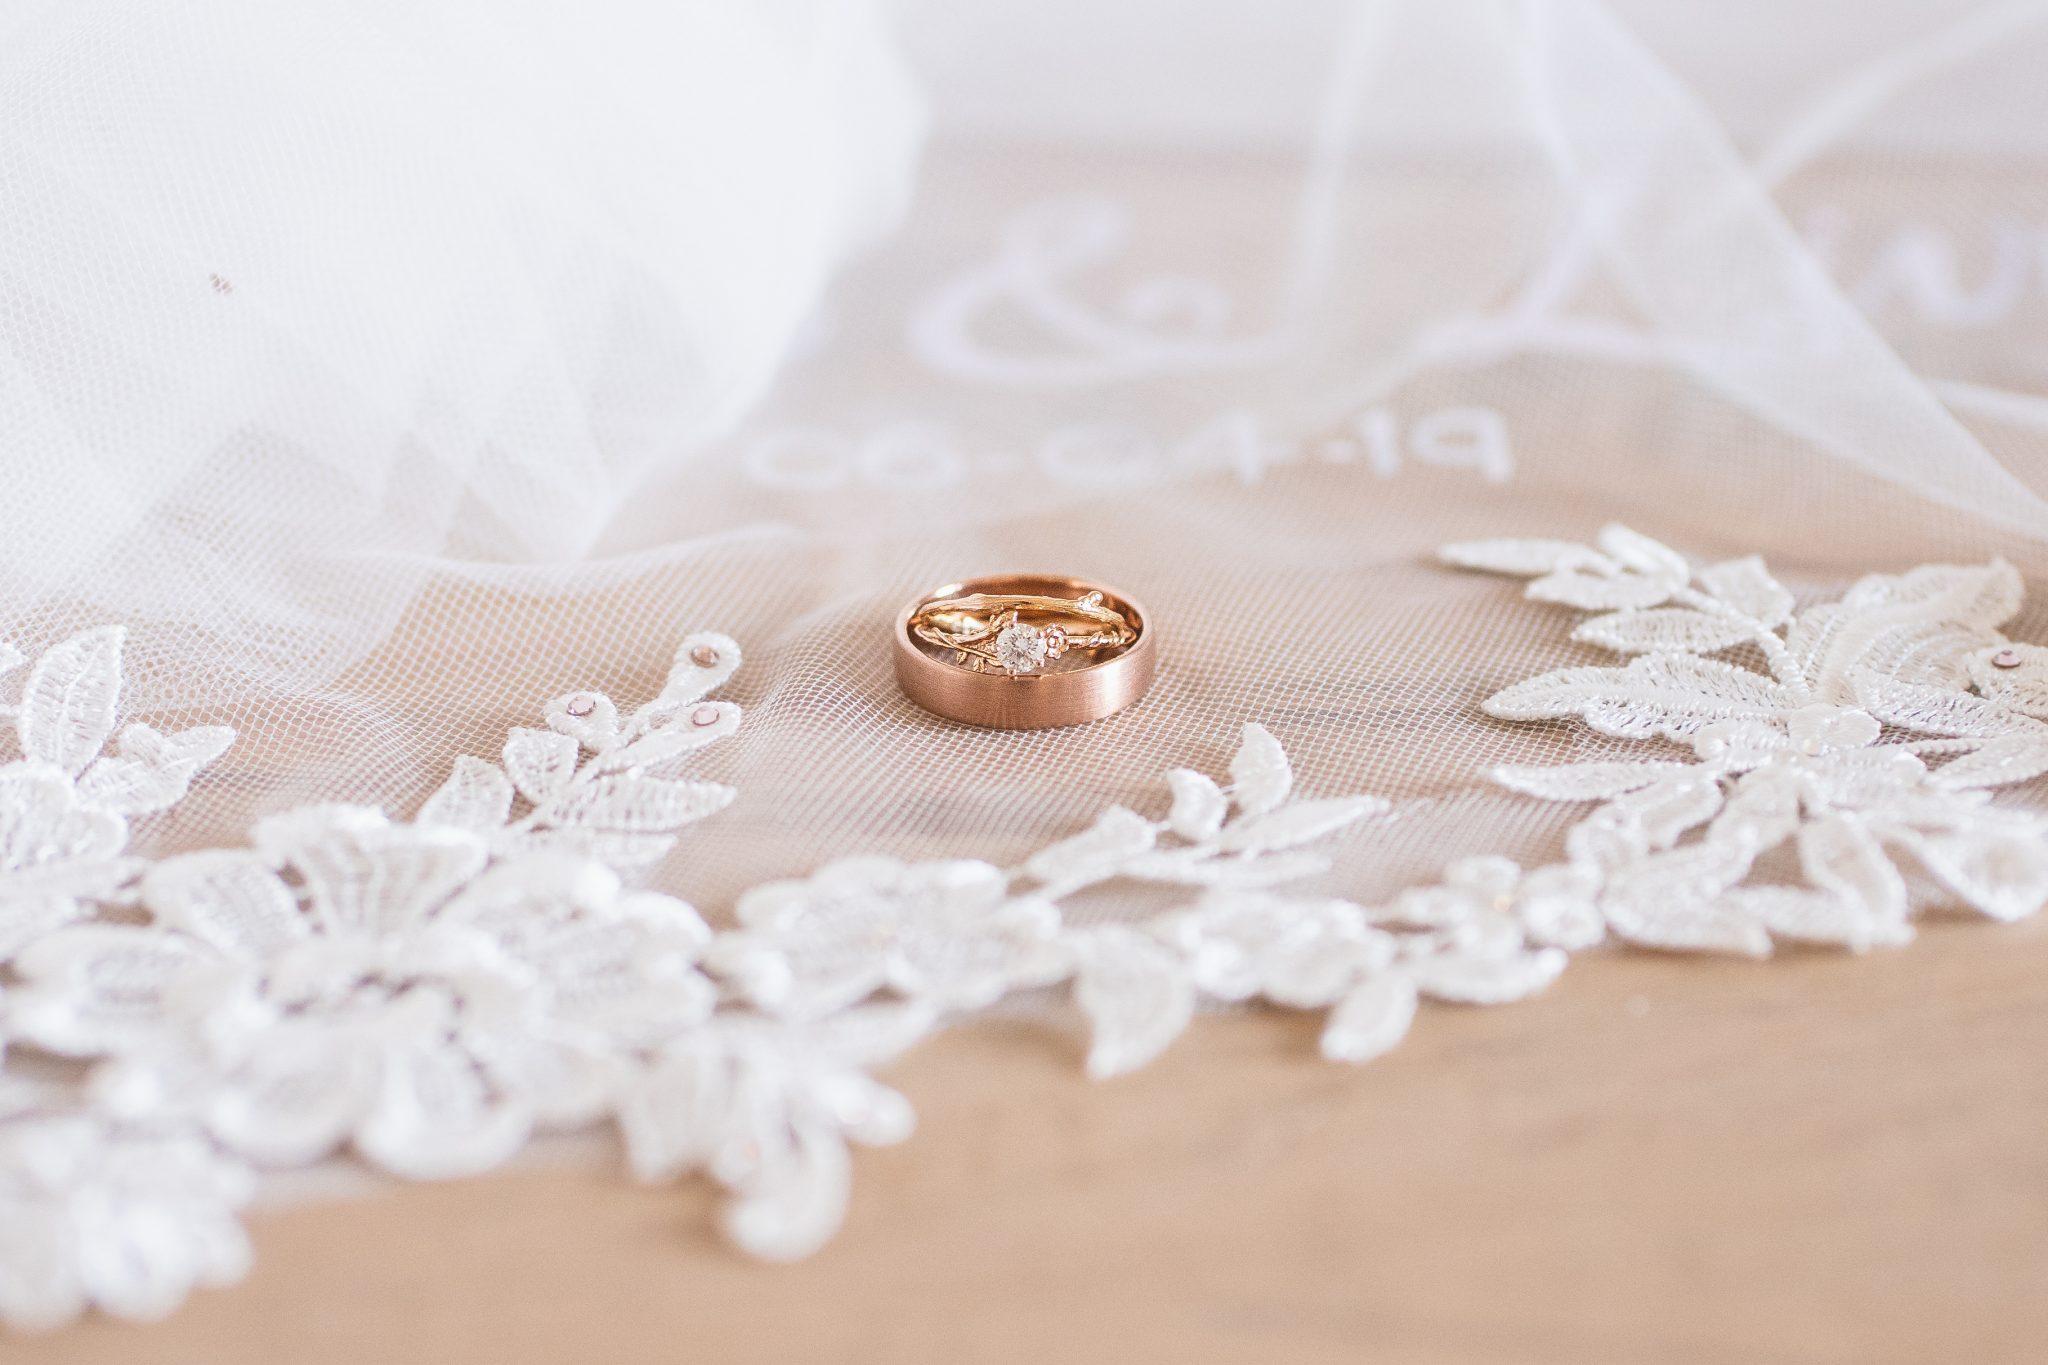 Wedding Rig Shots Ideas with the veil